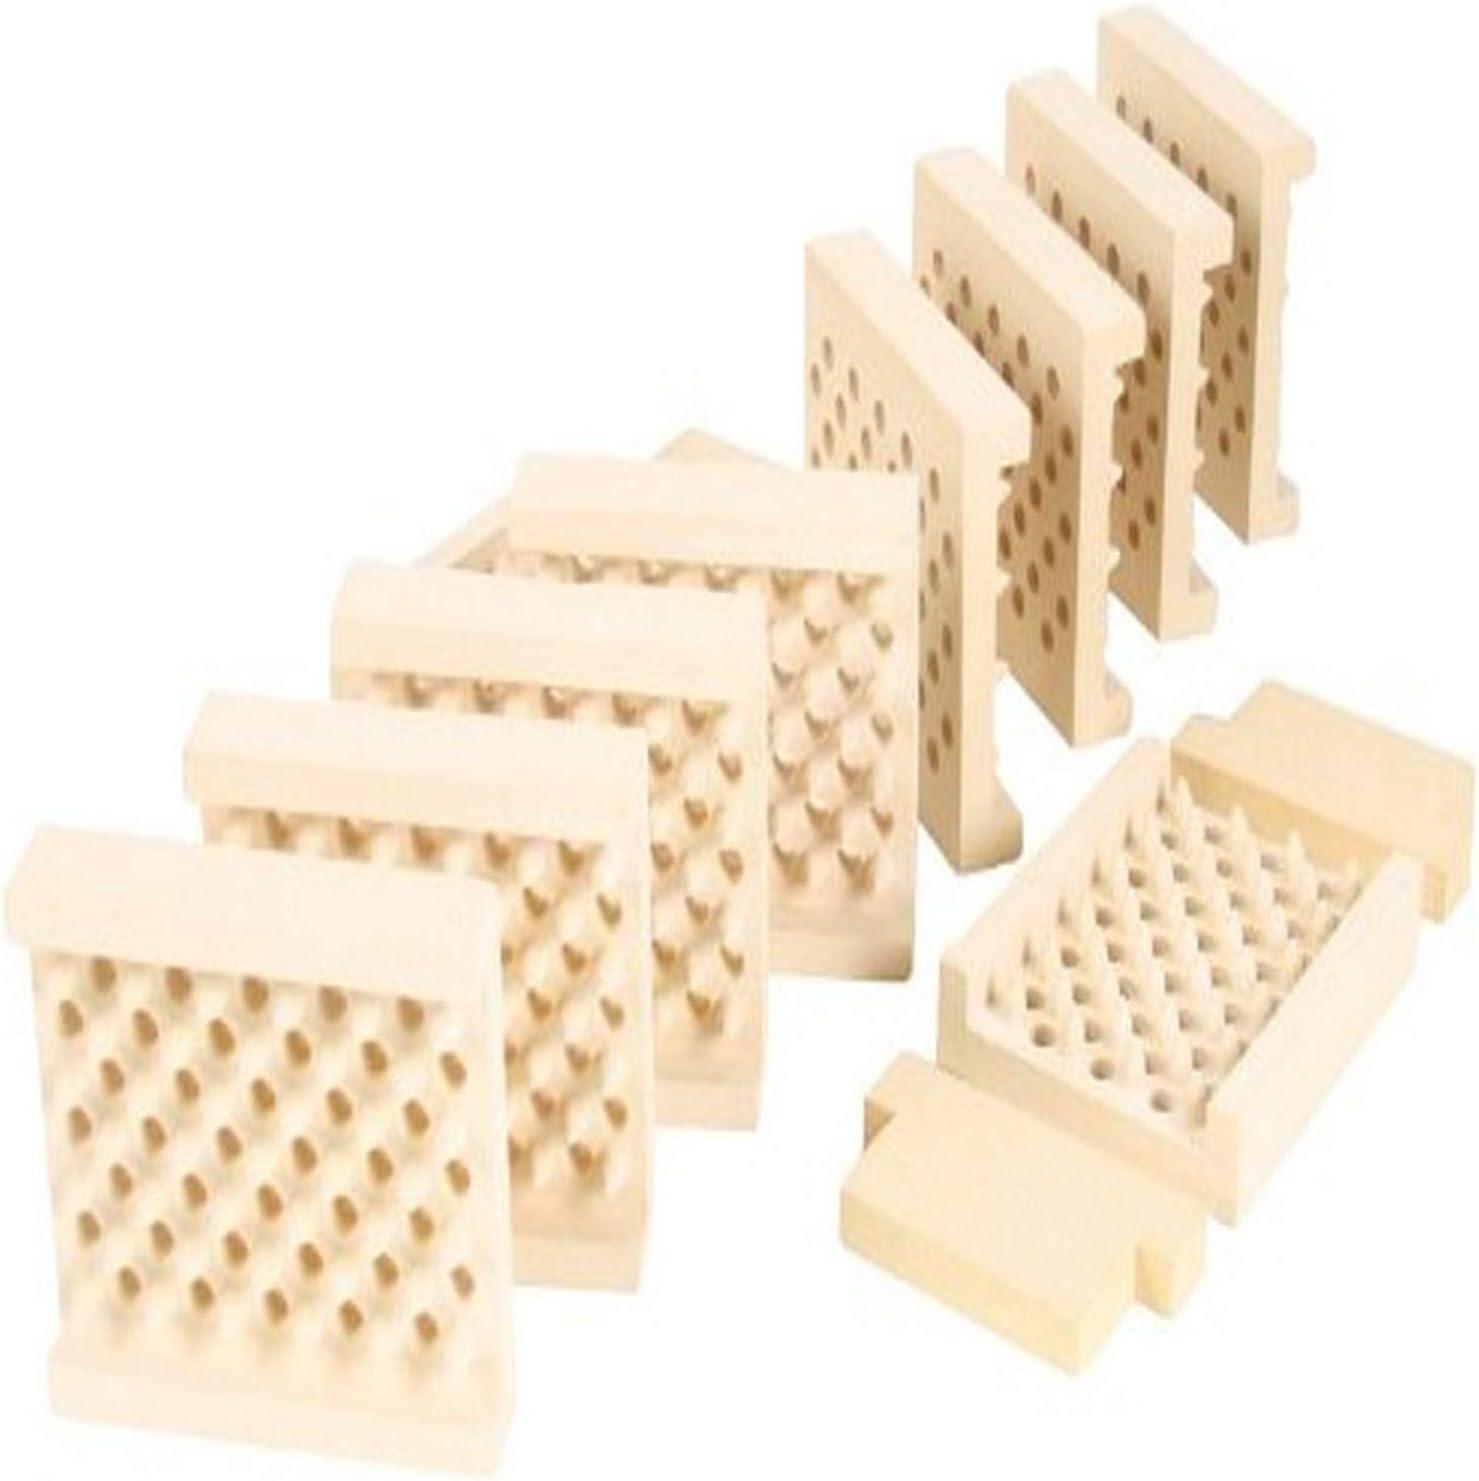 Montague 28387-8 Ceramic Kit